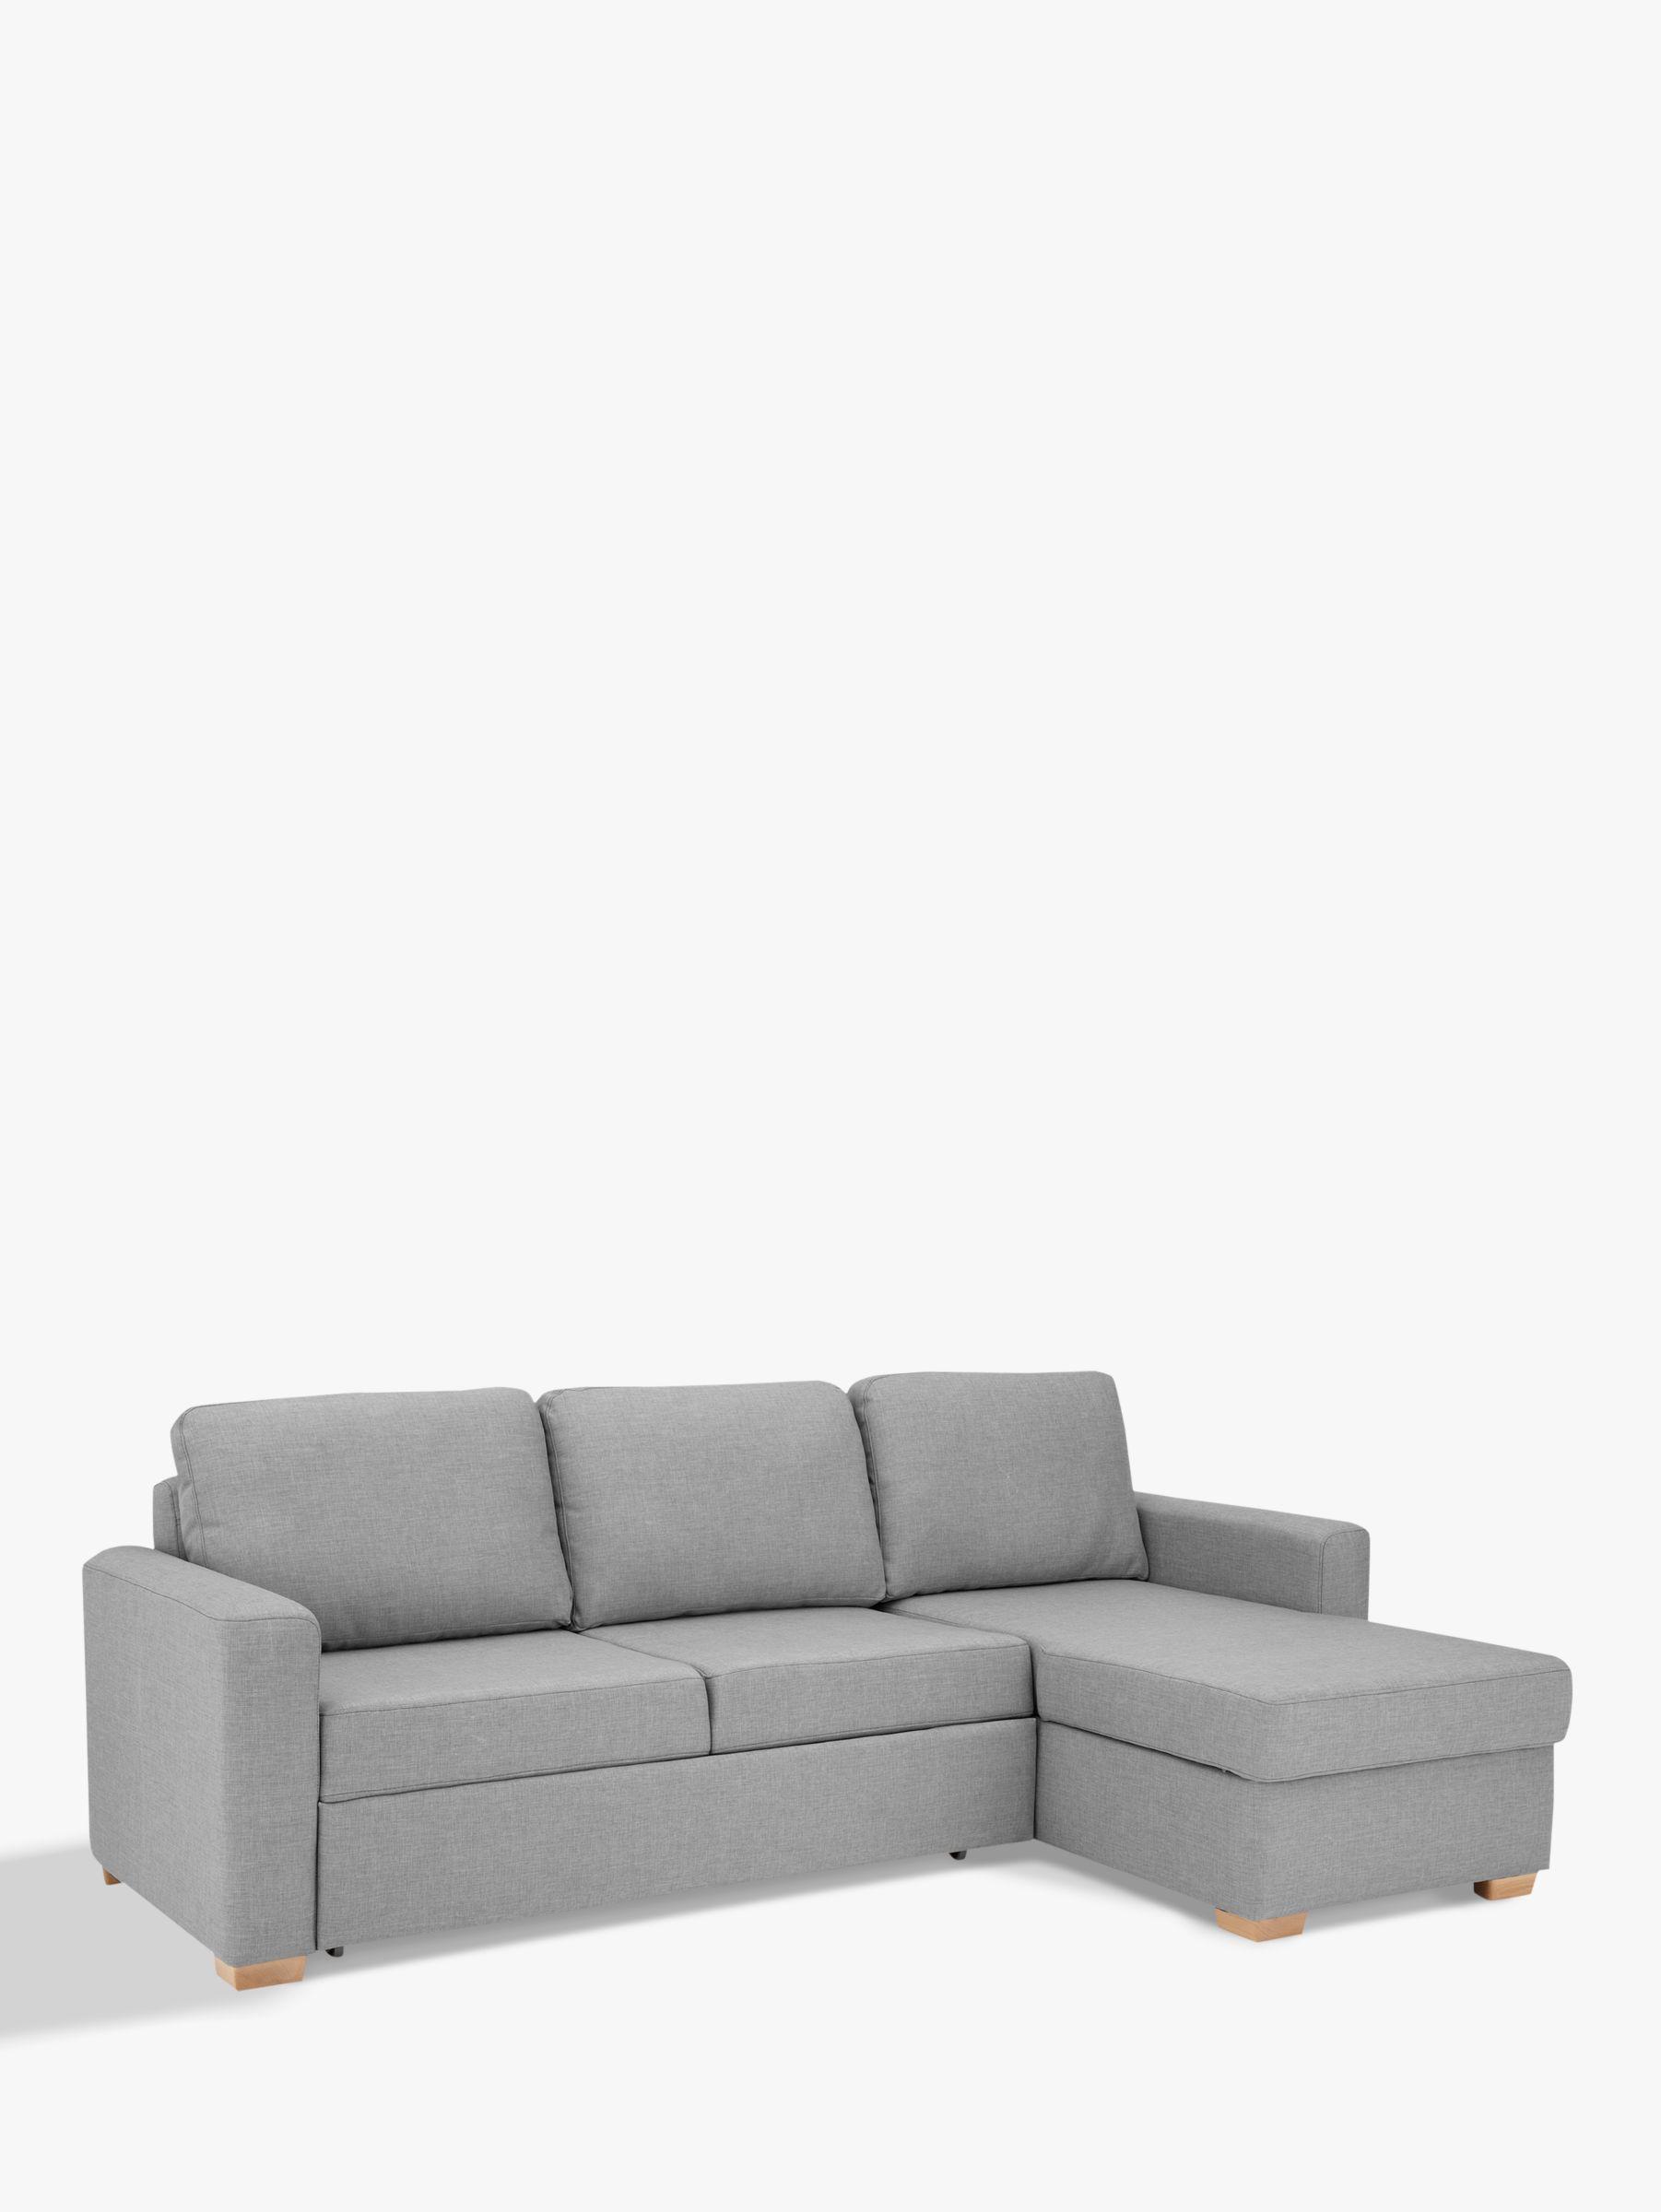 john lewis sofa clearance. Black Bedroom Furniture Sets. Home Design Ideas